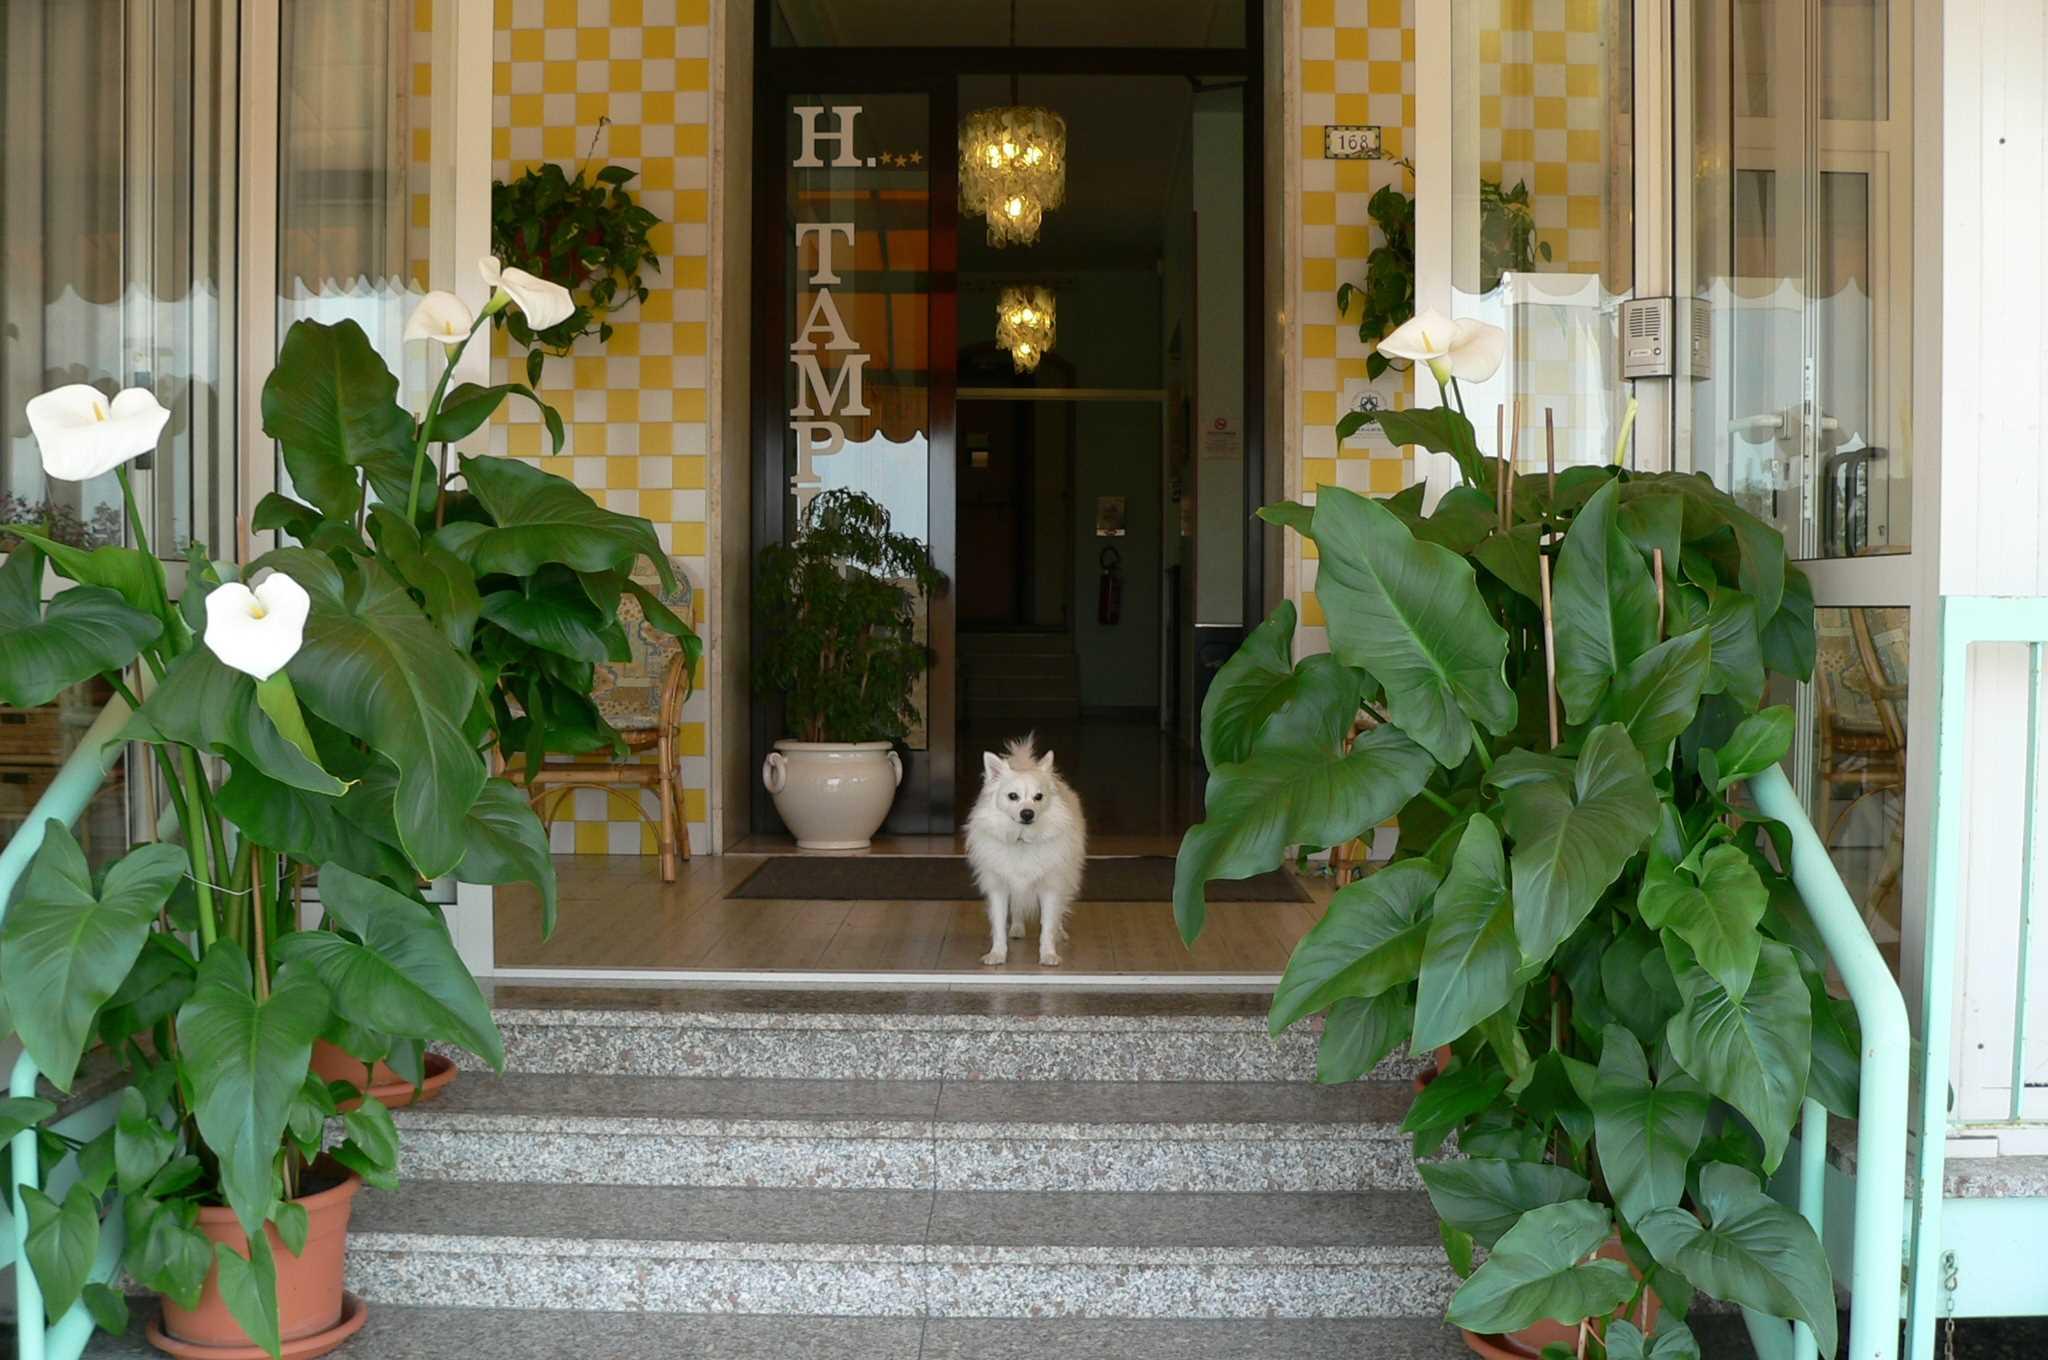 http://www.hoteltampico.it/wp-content/uploads/2016/05/P1030663_1.jpg